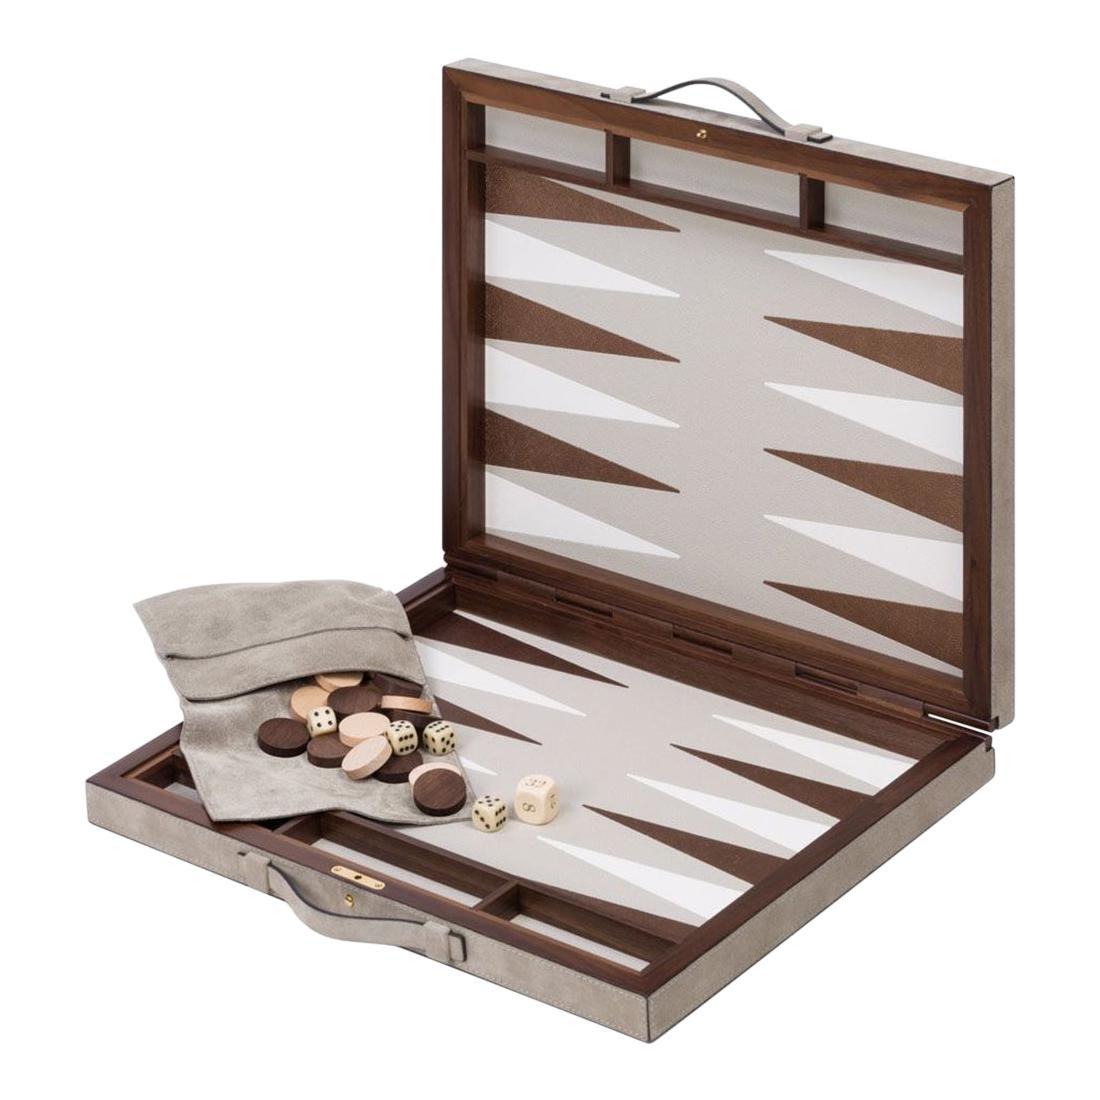 Guapo Backgammon